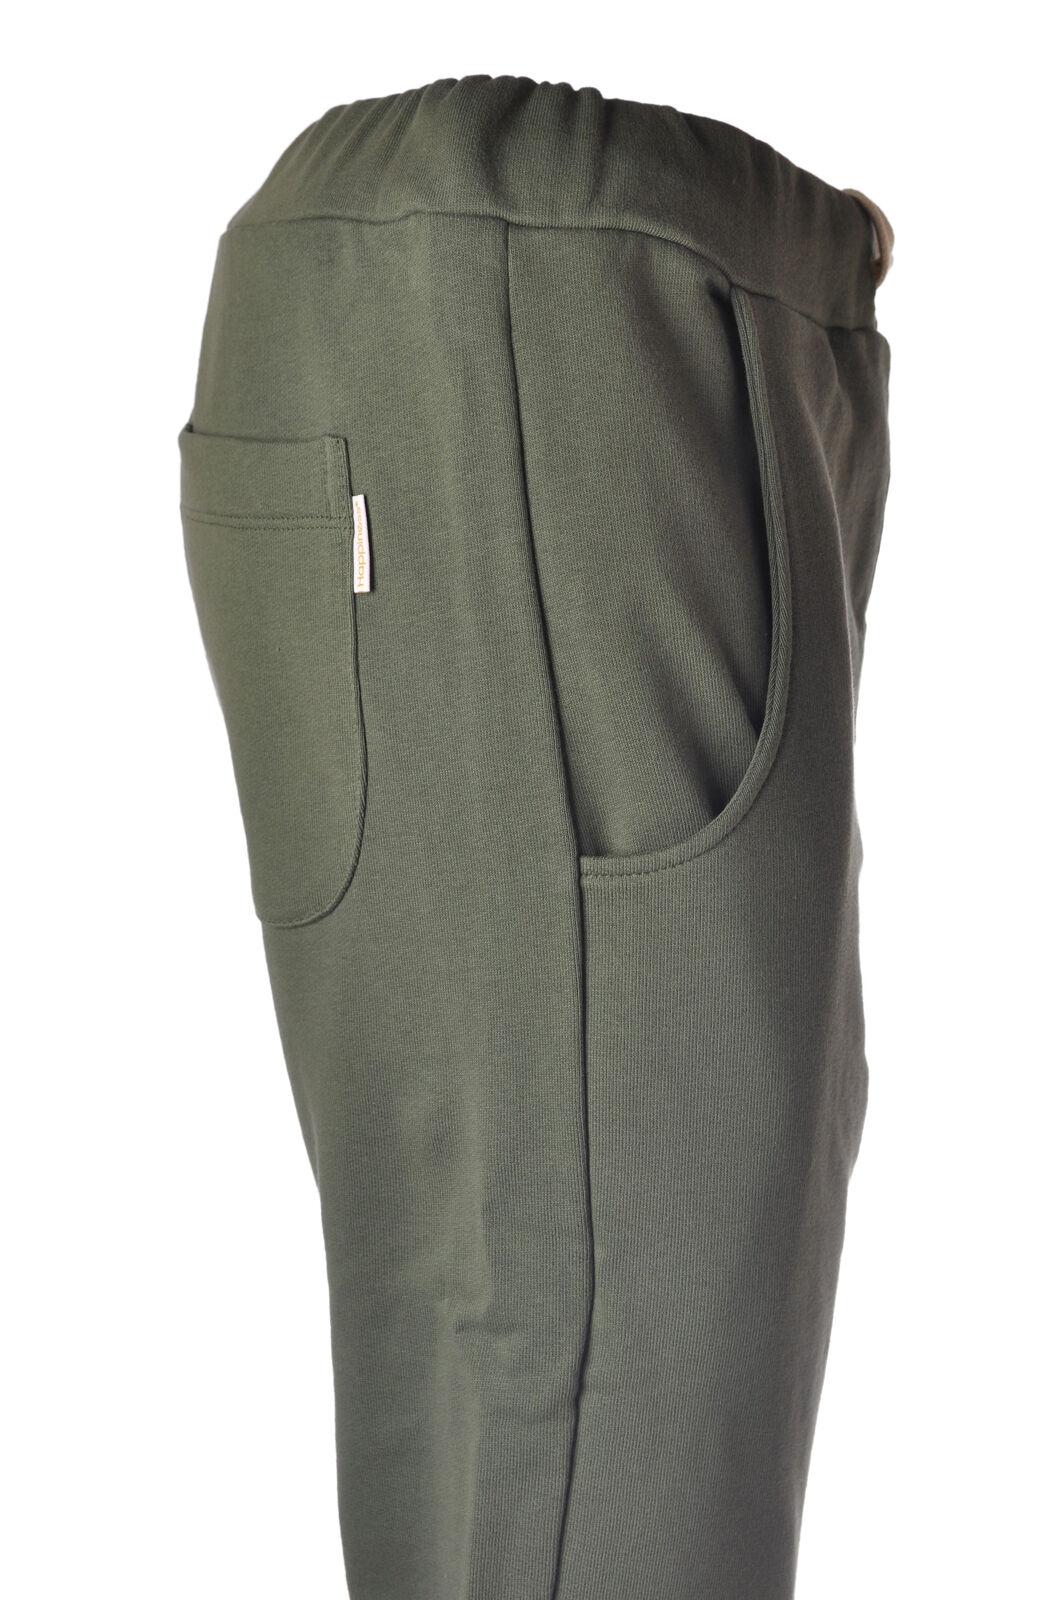 Happiness - Pantaloni-Pantaloni felpa - men - green - 4901615B181548